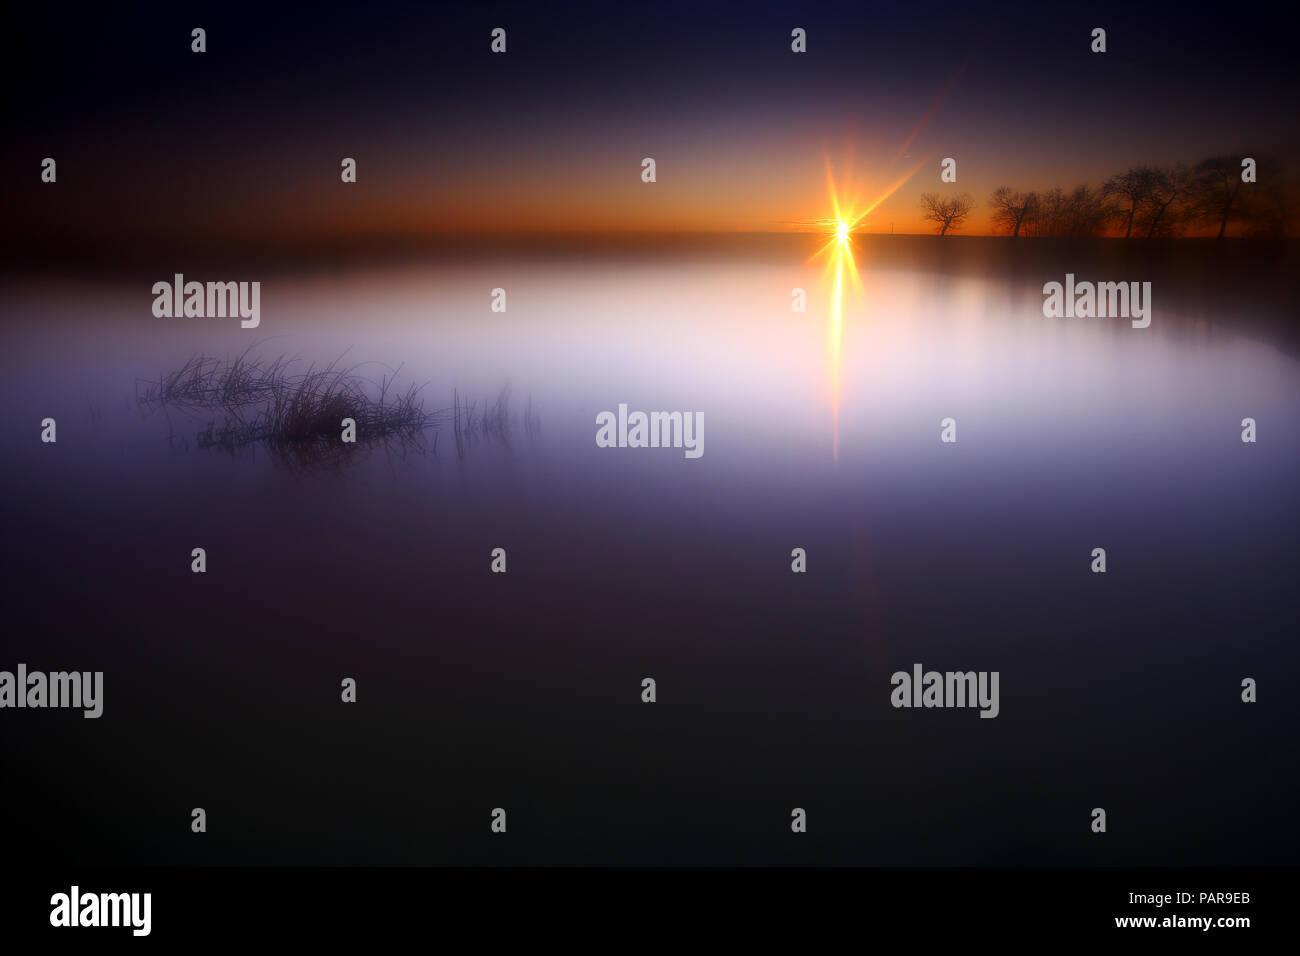 Spain, Castilla y Leon, Province of Zamora, Reserva natural de Lagunas de Villafafila, lake at sunset - Stock Image